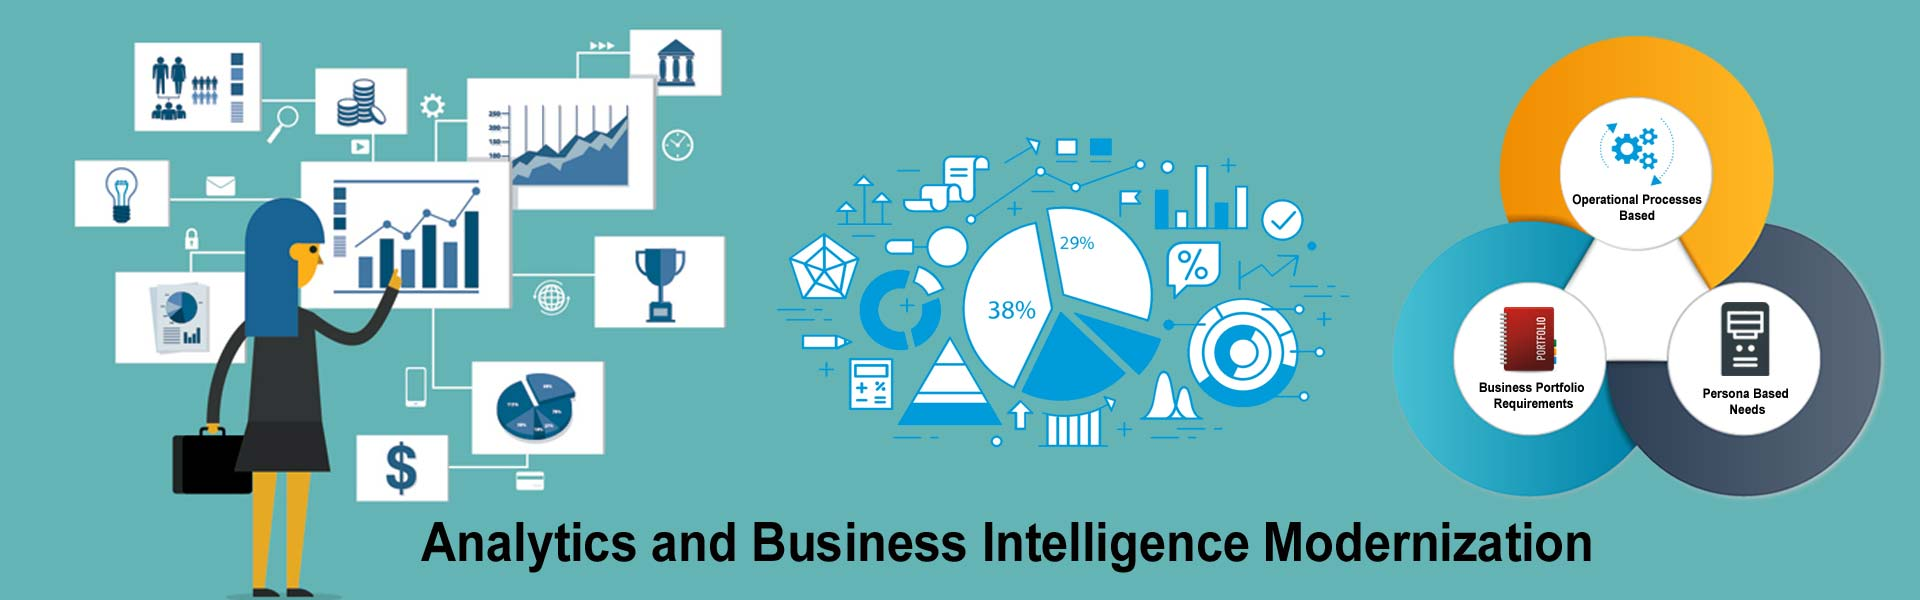 Analytics and Business Intelligence Modernization